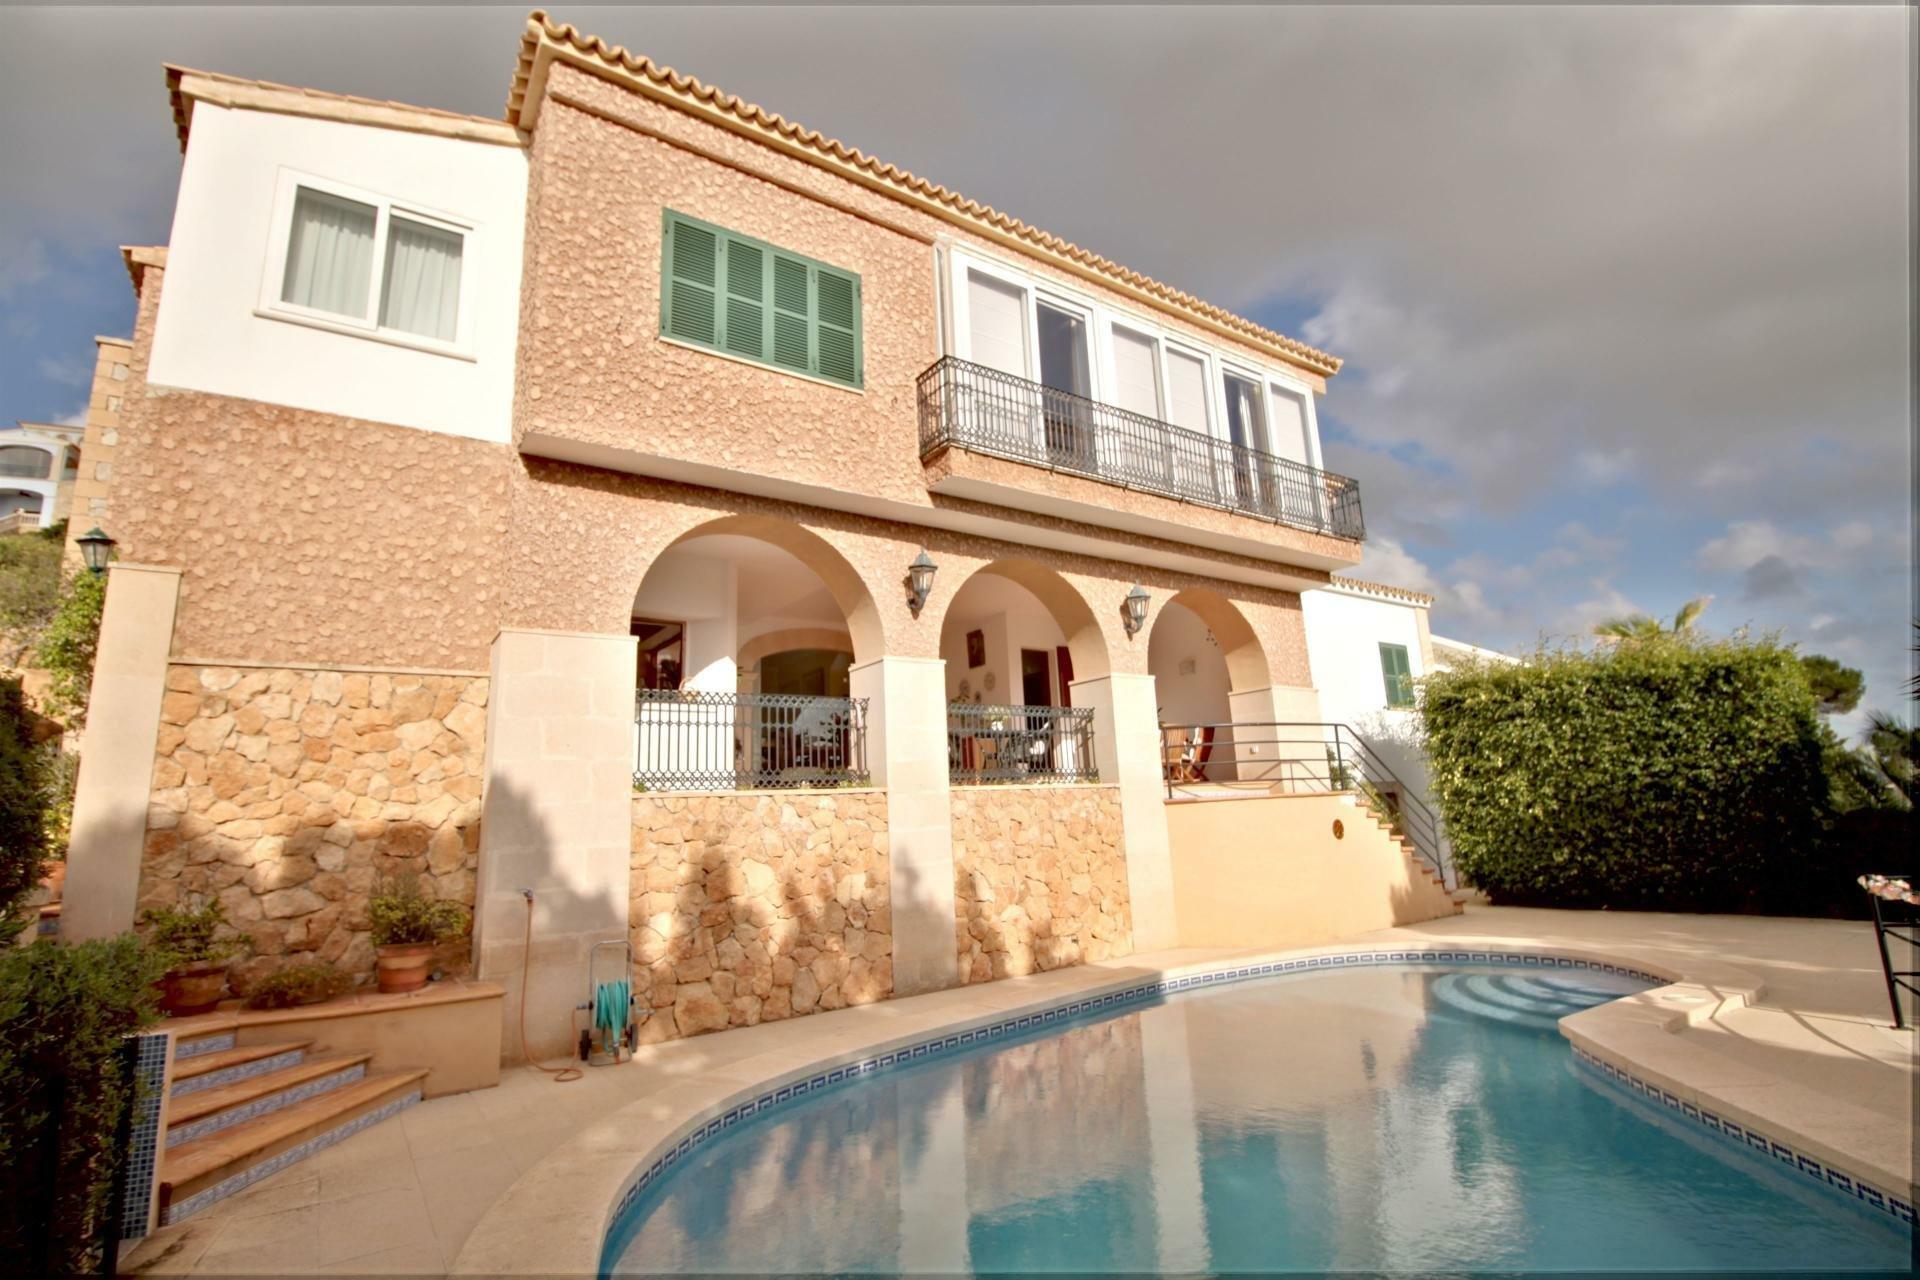 Villa in Santa Ponça, Balearic Islands, Spain 1 - 10848534